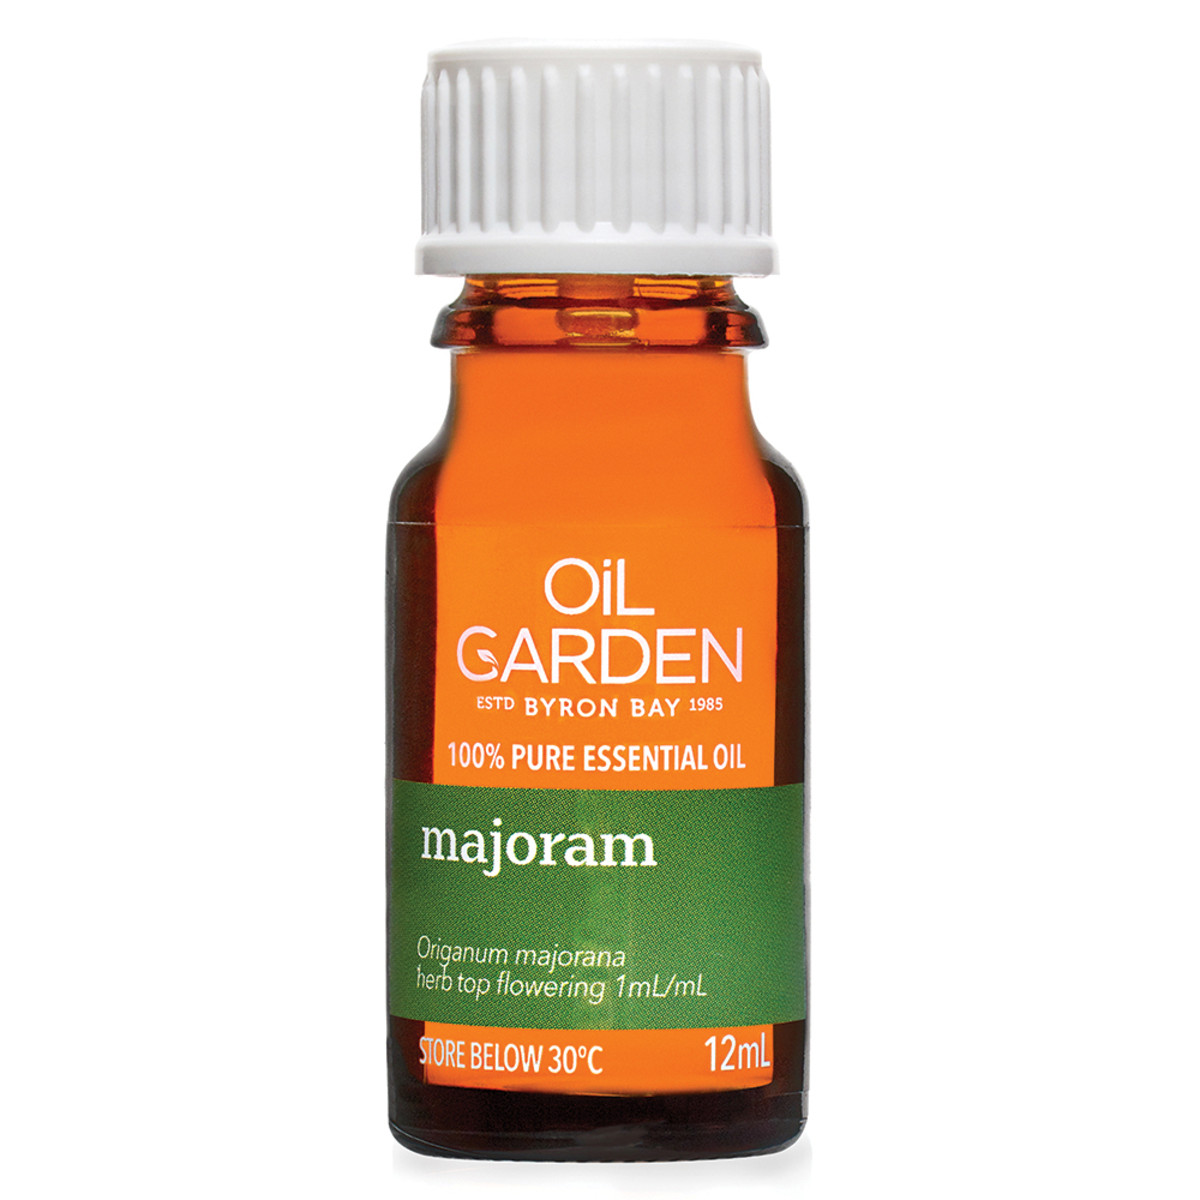 the-oil-garden-marjoram-essential-oil-12ml